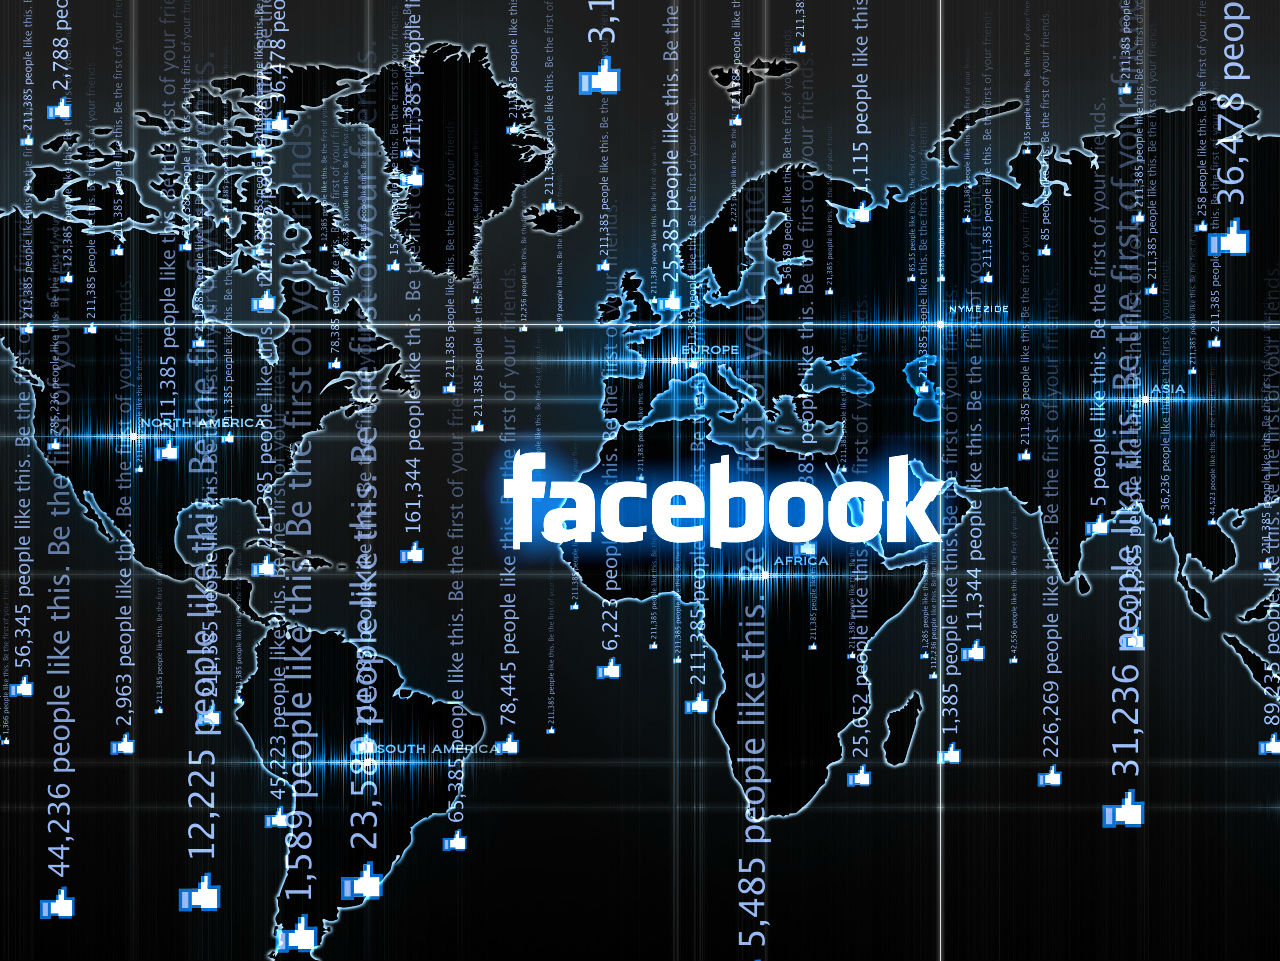 wallpapers facebook o fondos de pantalla del facebook